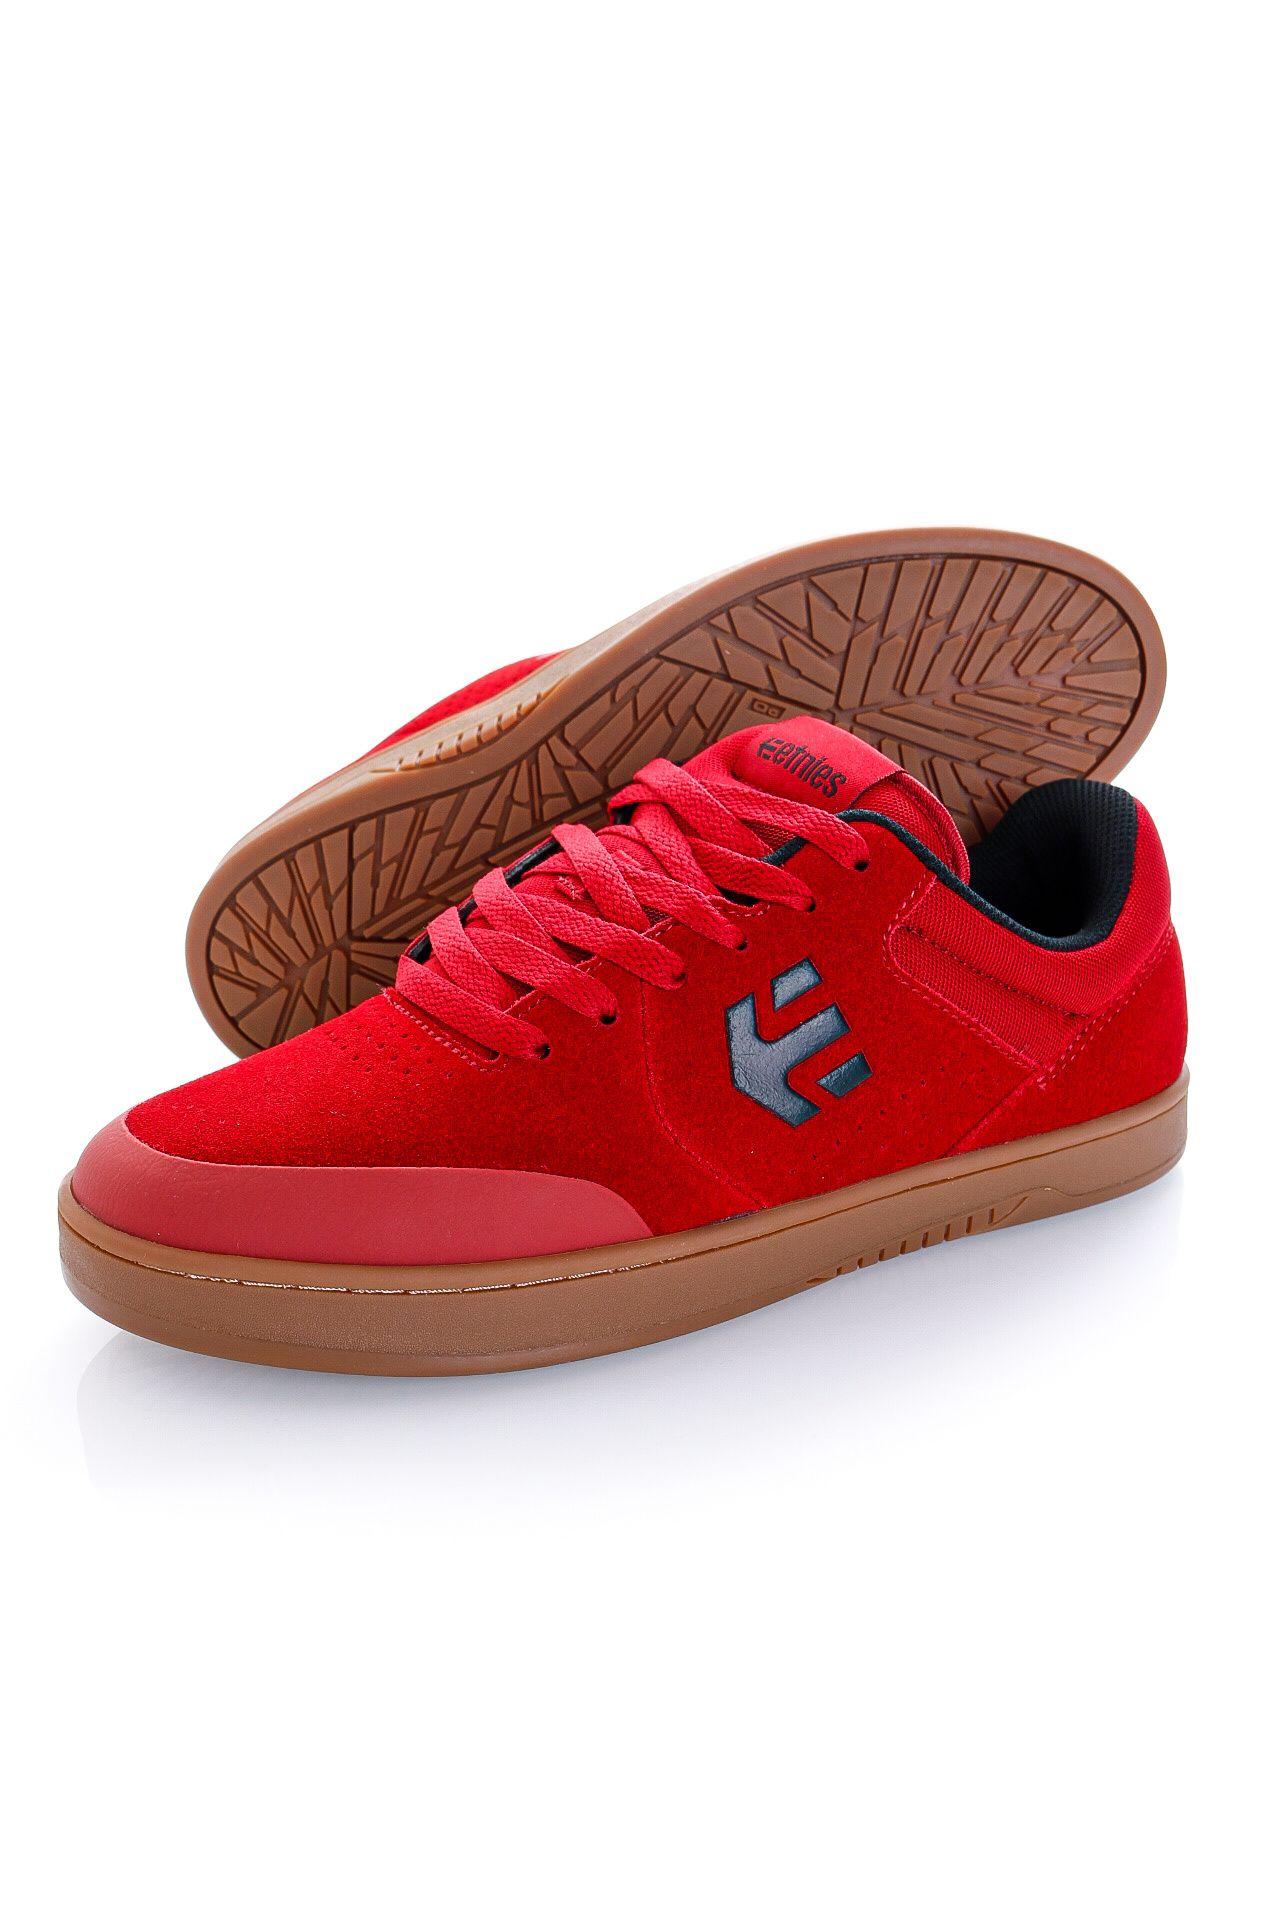 Afbeelding van Etnies Sneakers MARANA RED/GUM 4101000403